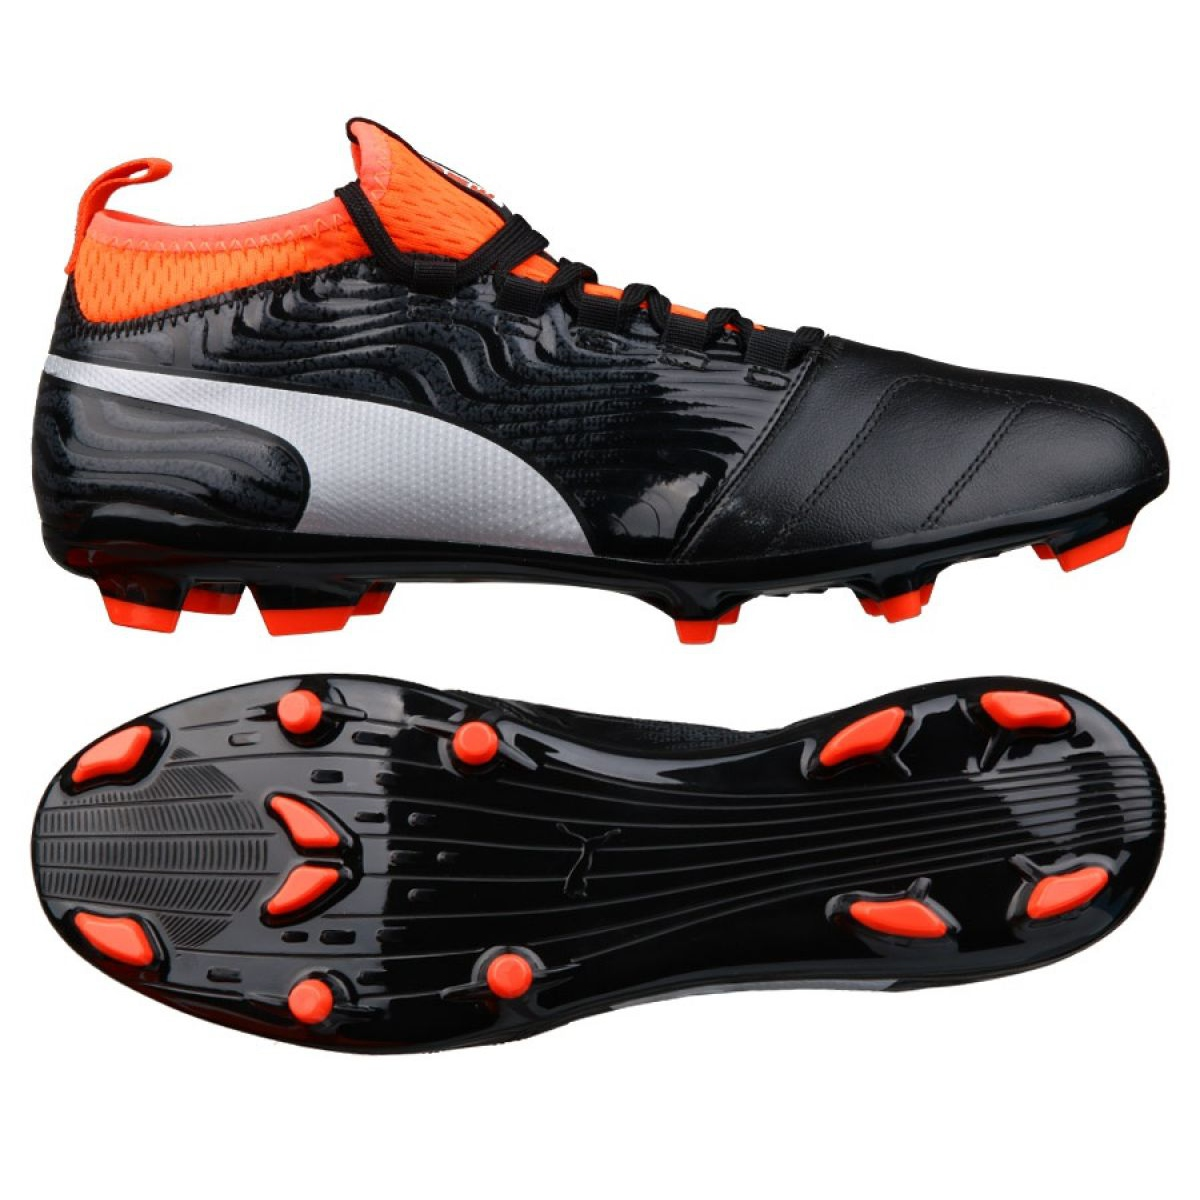 Details about Football boots Puma One 18.3 Fg M 104538 01 black black